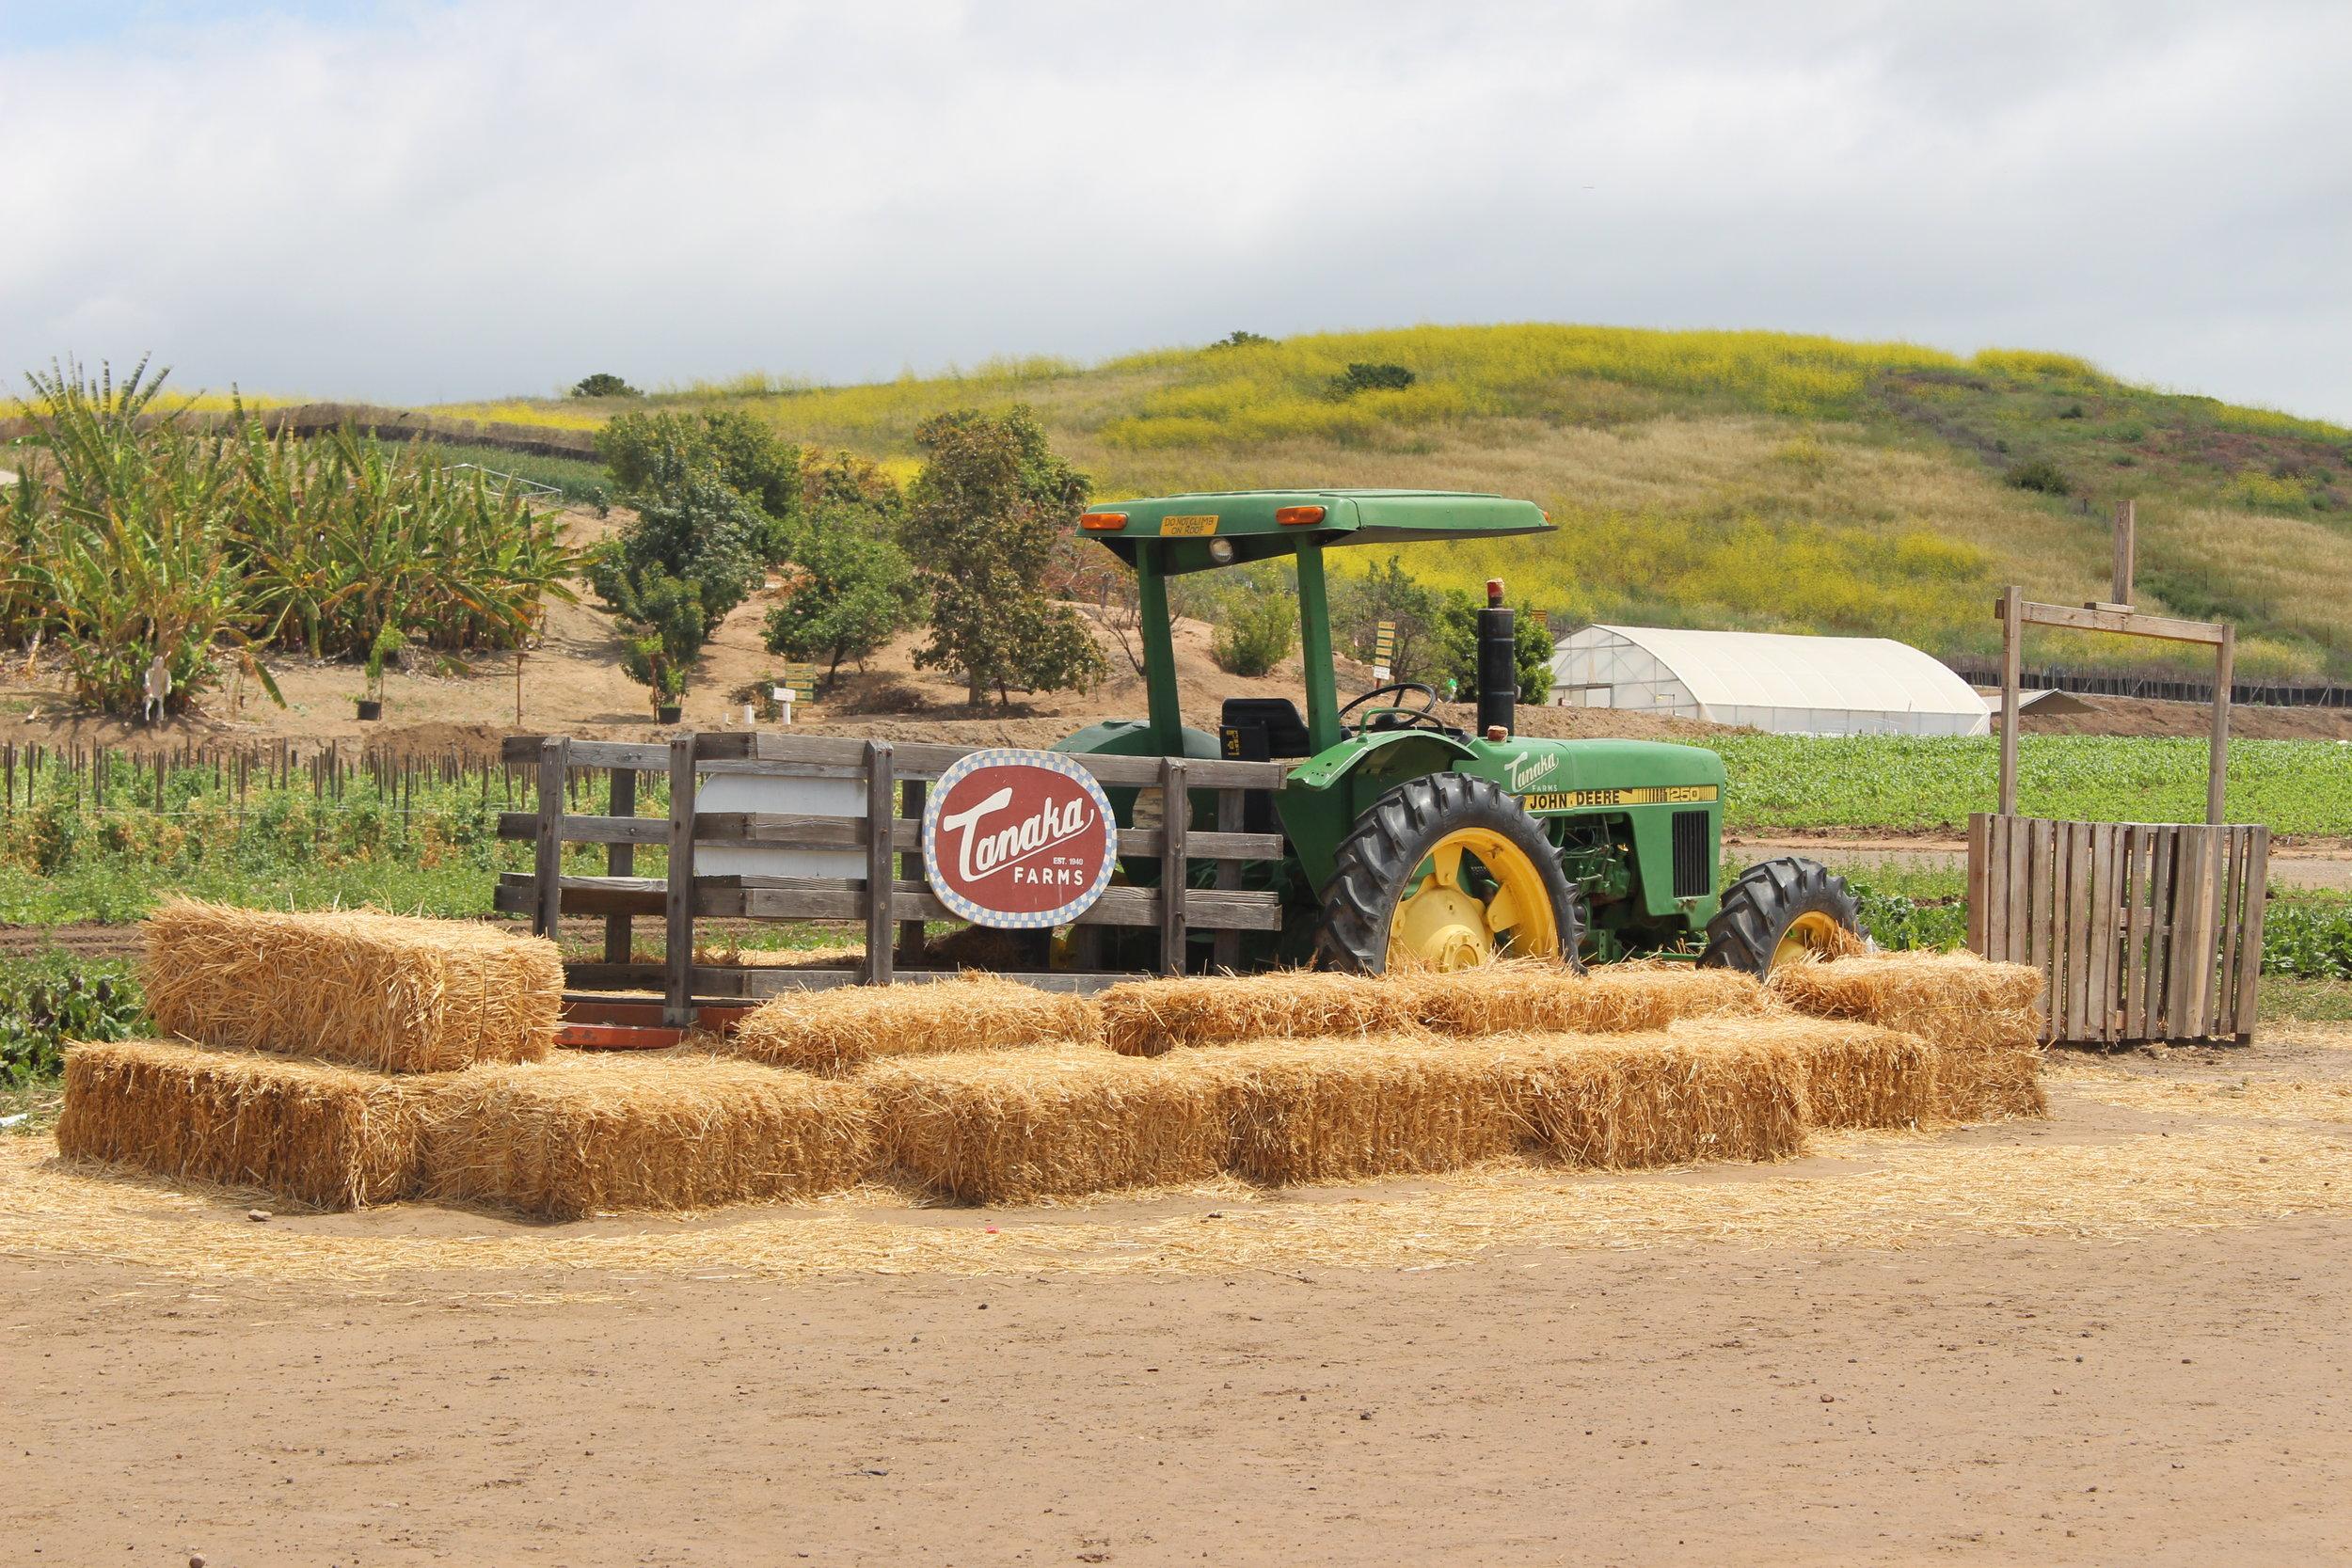 Tour guides will discuss the farm's responsible farming methods.